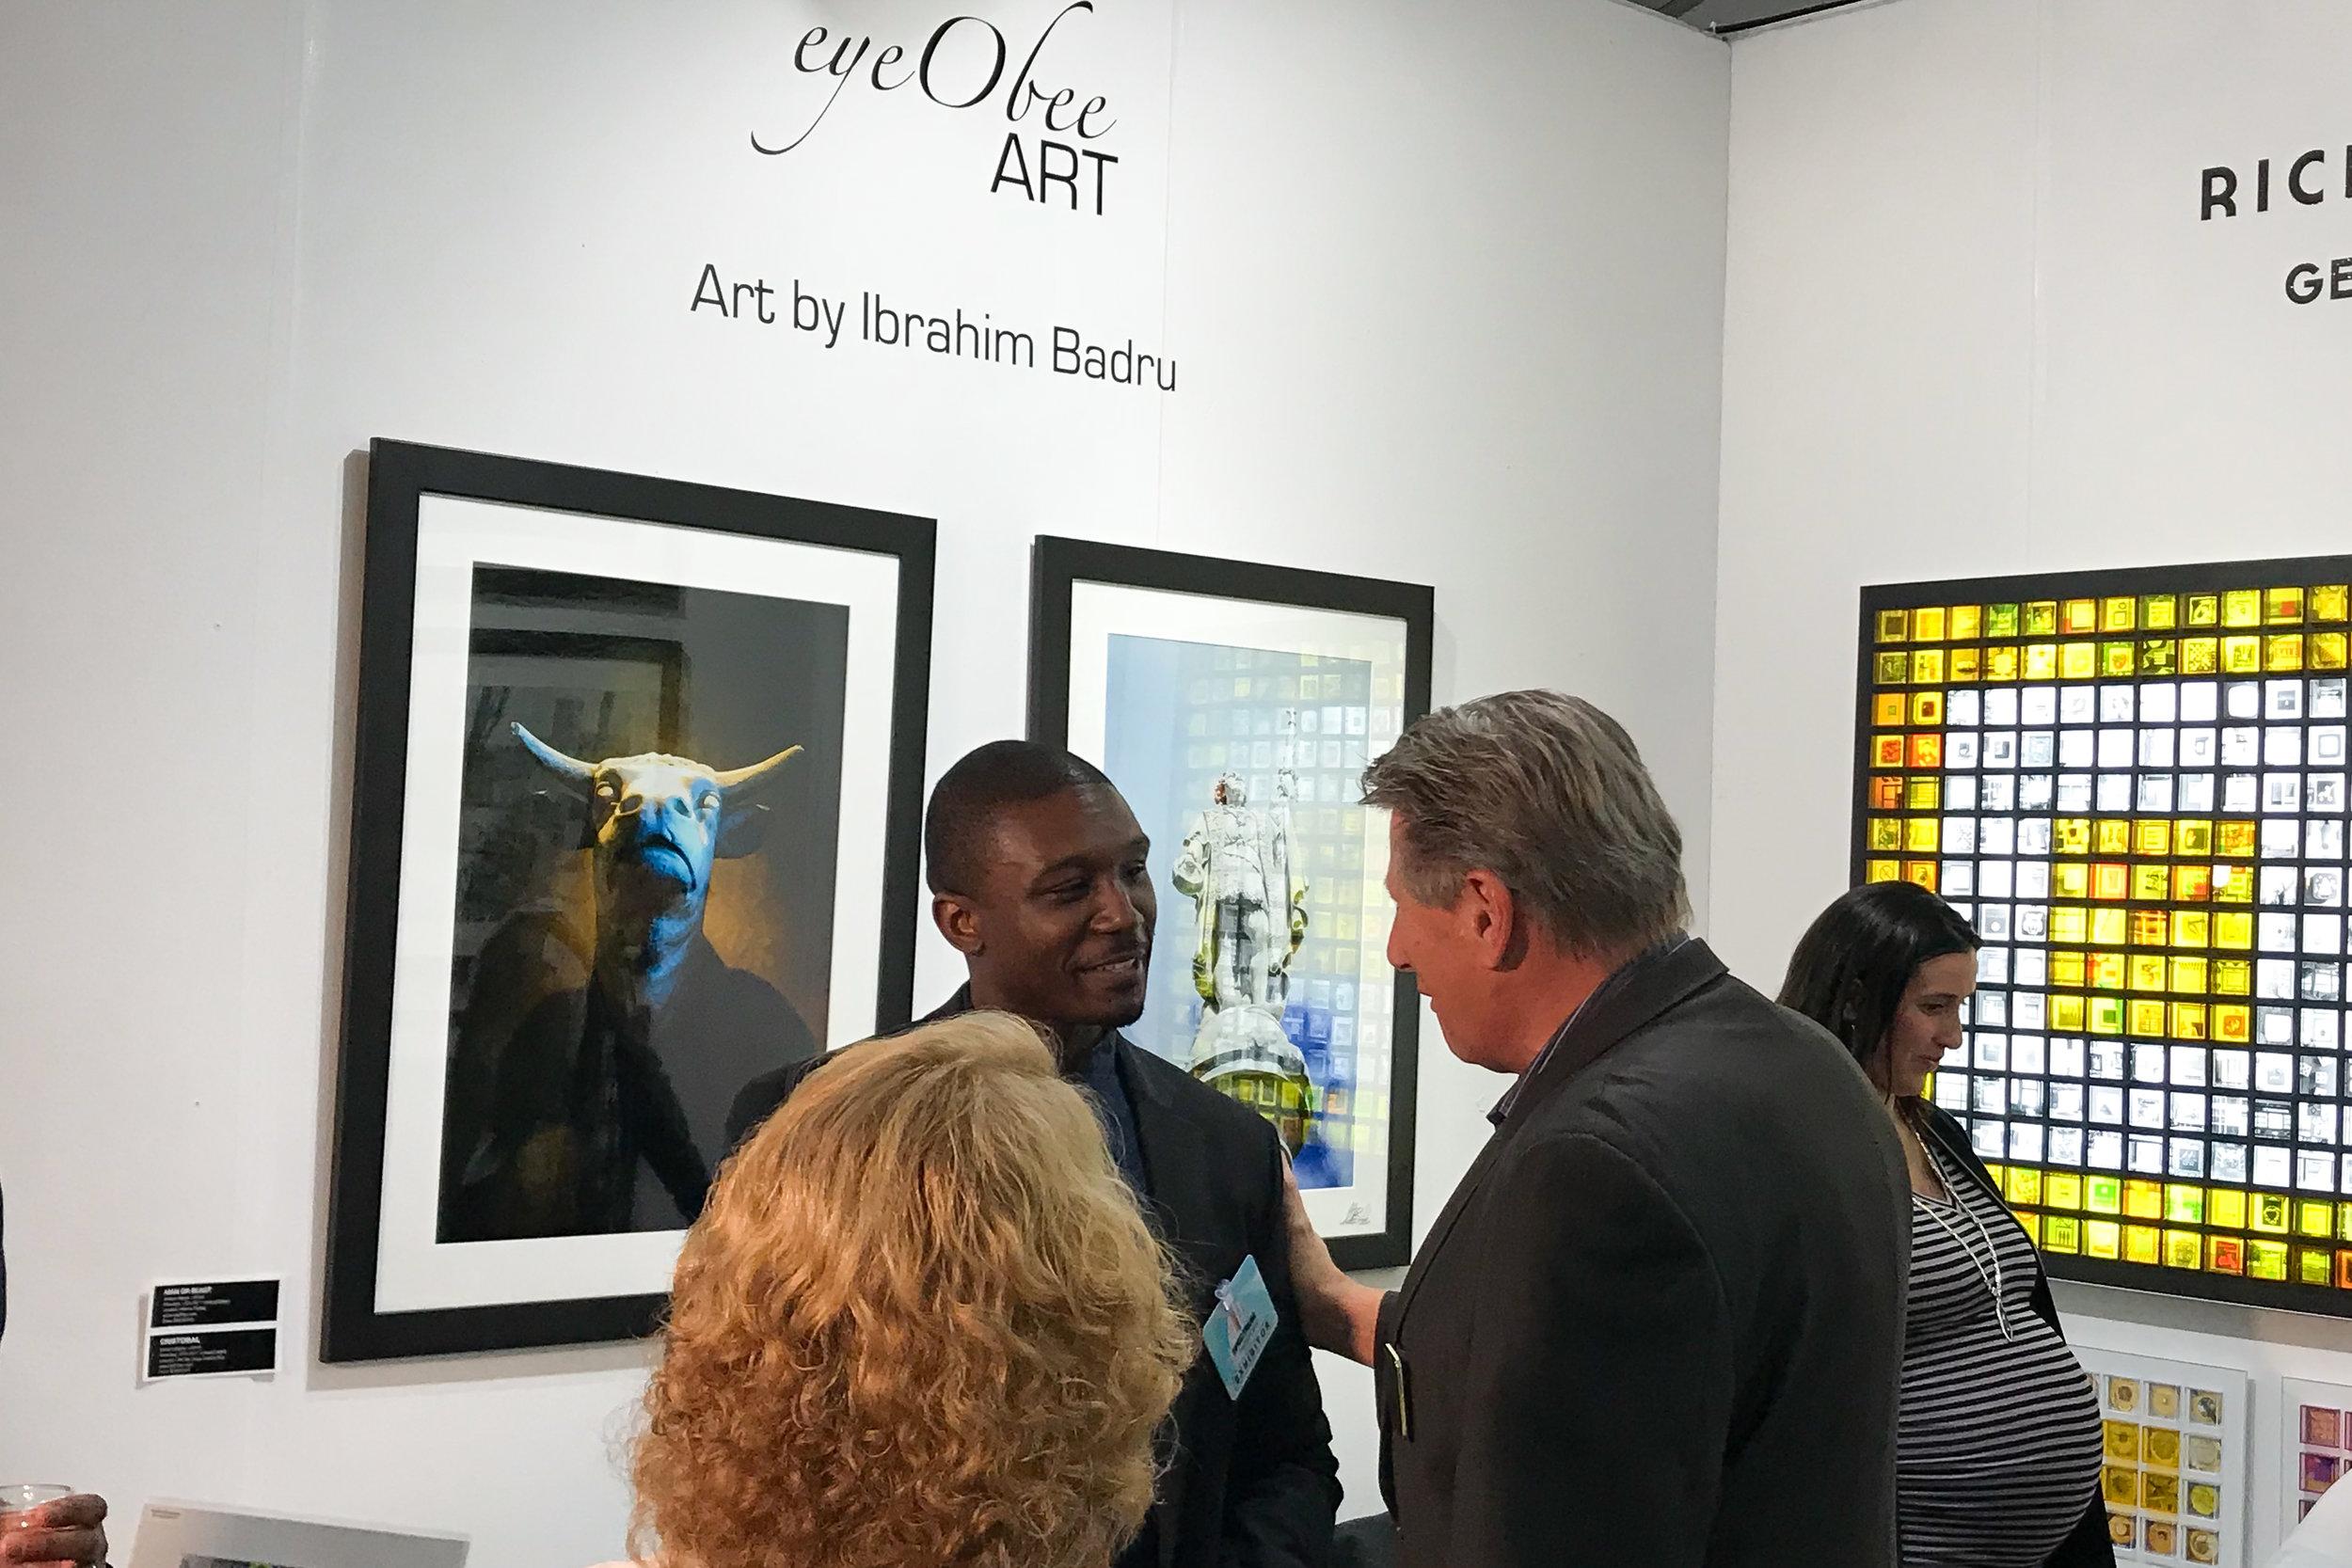 Spectrum Miami Art Basel eyeObee Art by Ibrahim Badru Photo solo Rick Barnett